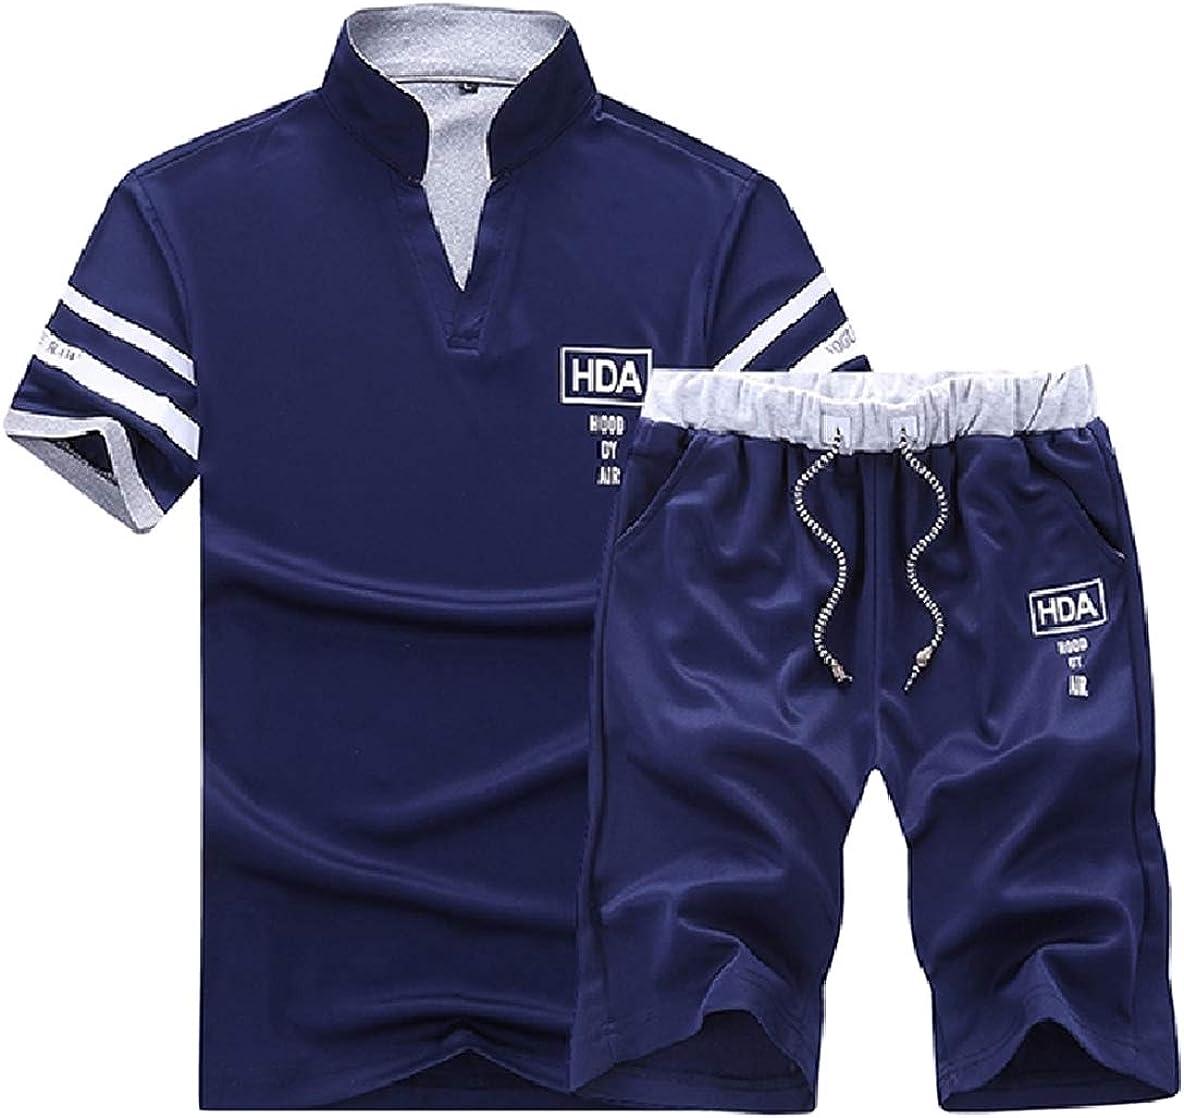 Winwinus Mens Absorb Sweat Summer Oversize Breathable Jacket Sweatshirt Set